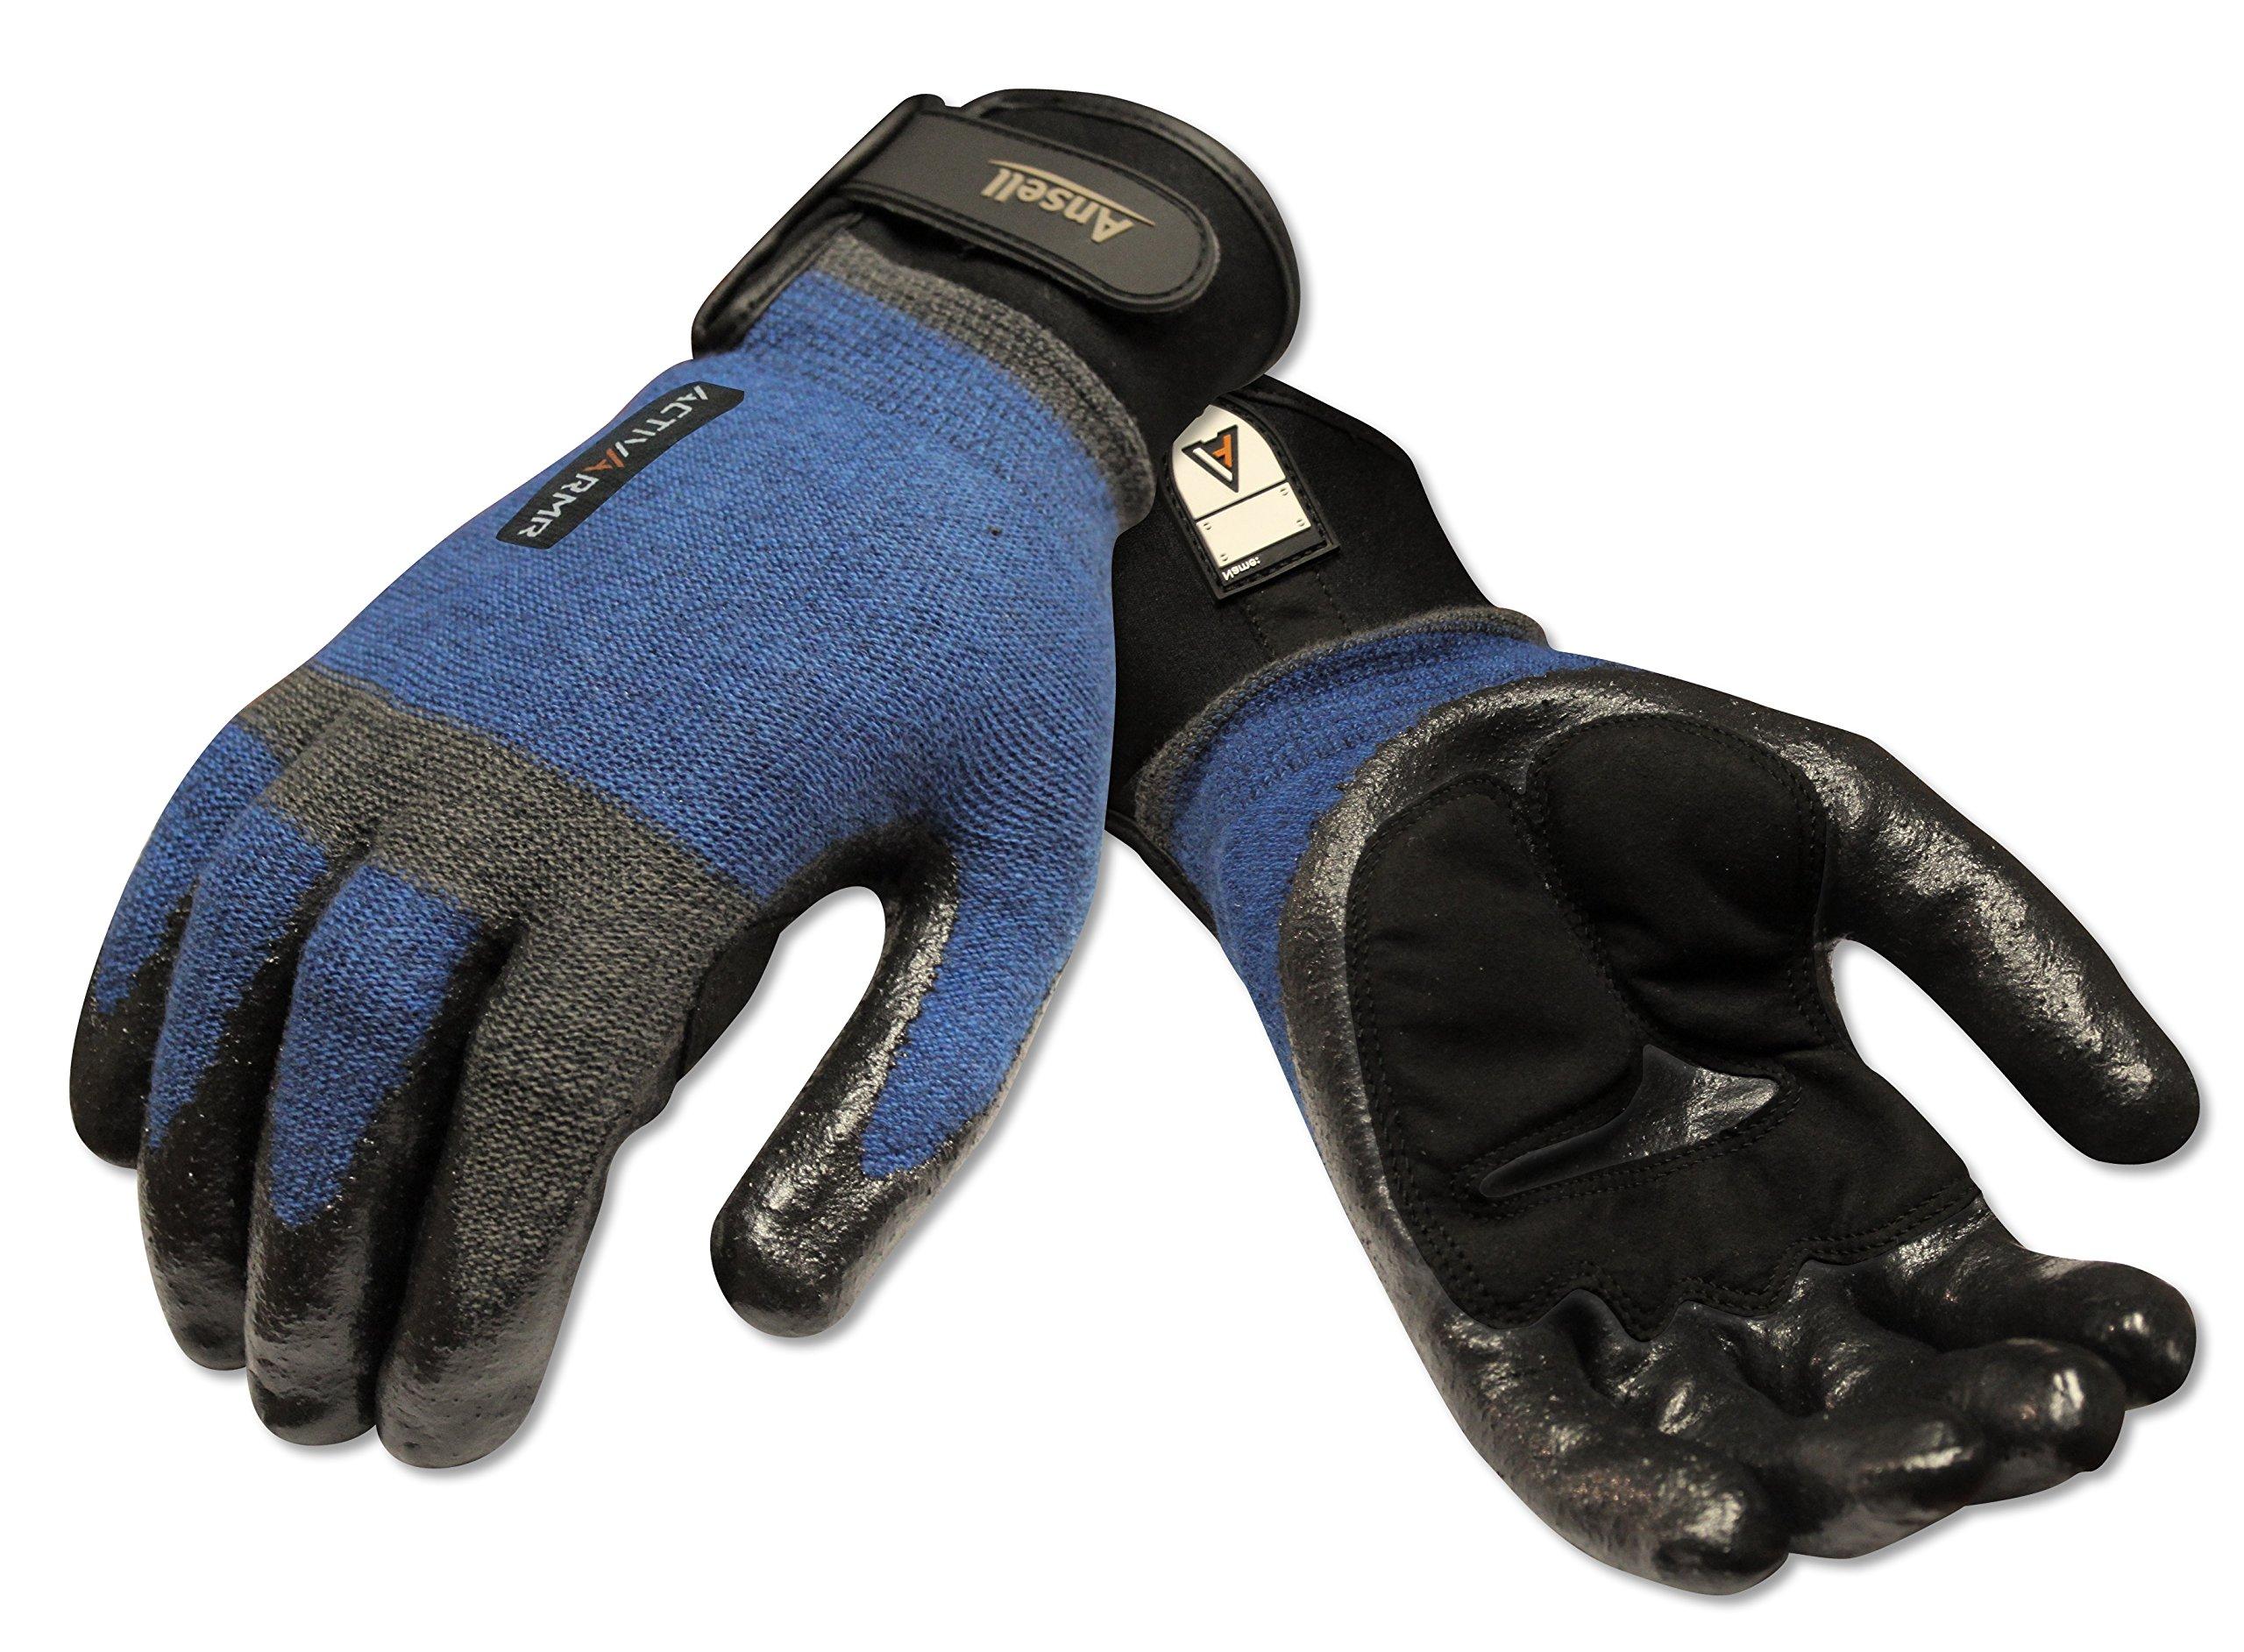 Ansell ActivArmr 97-003 Nitrile Coated Heavy Laborer Gloves, Cut Resistant, Adjustable Cuff, Medium, Blue/Black (1 Pair)